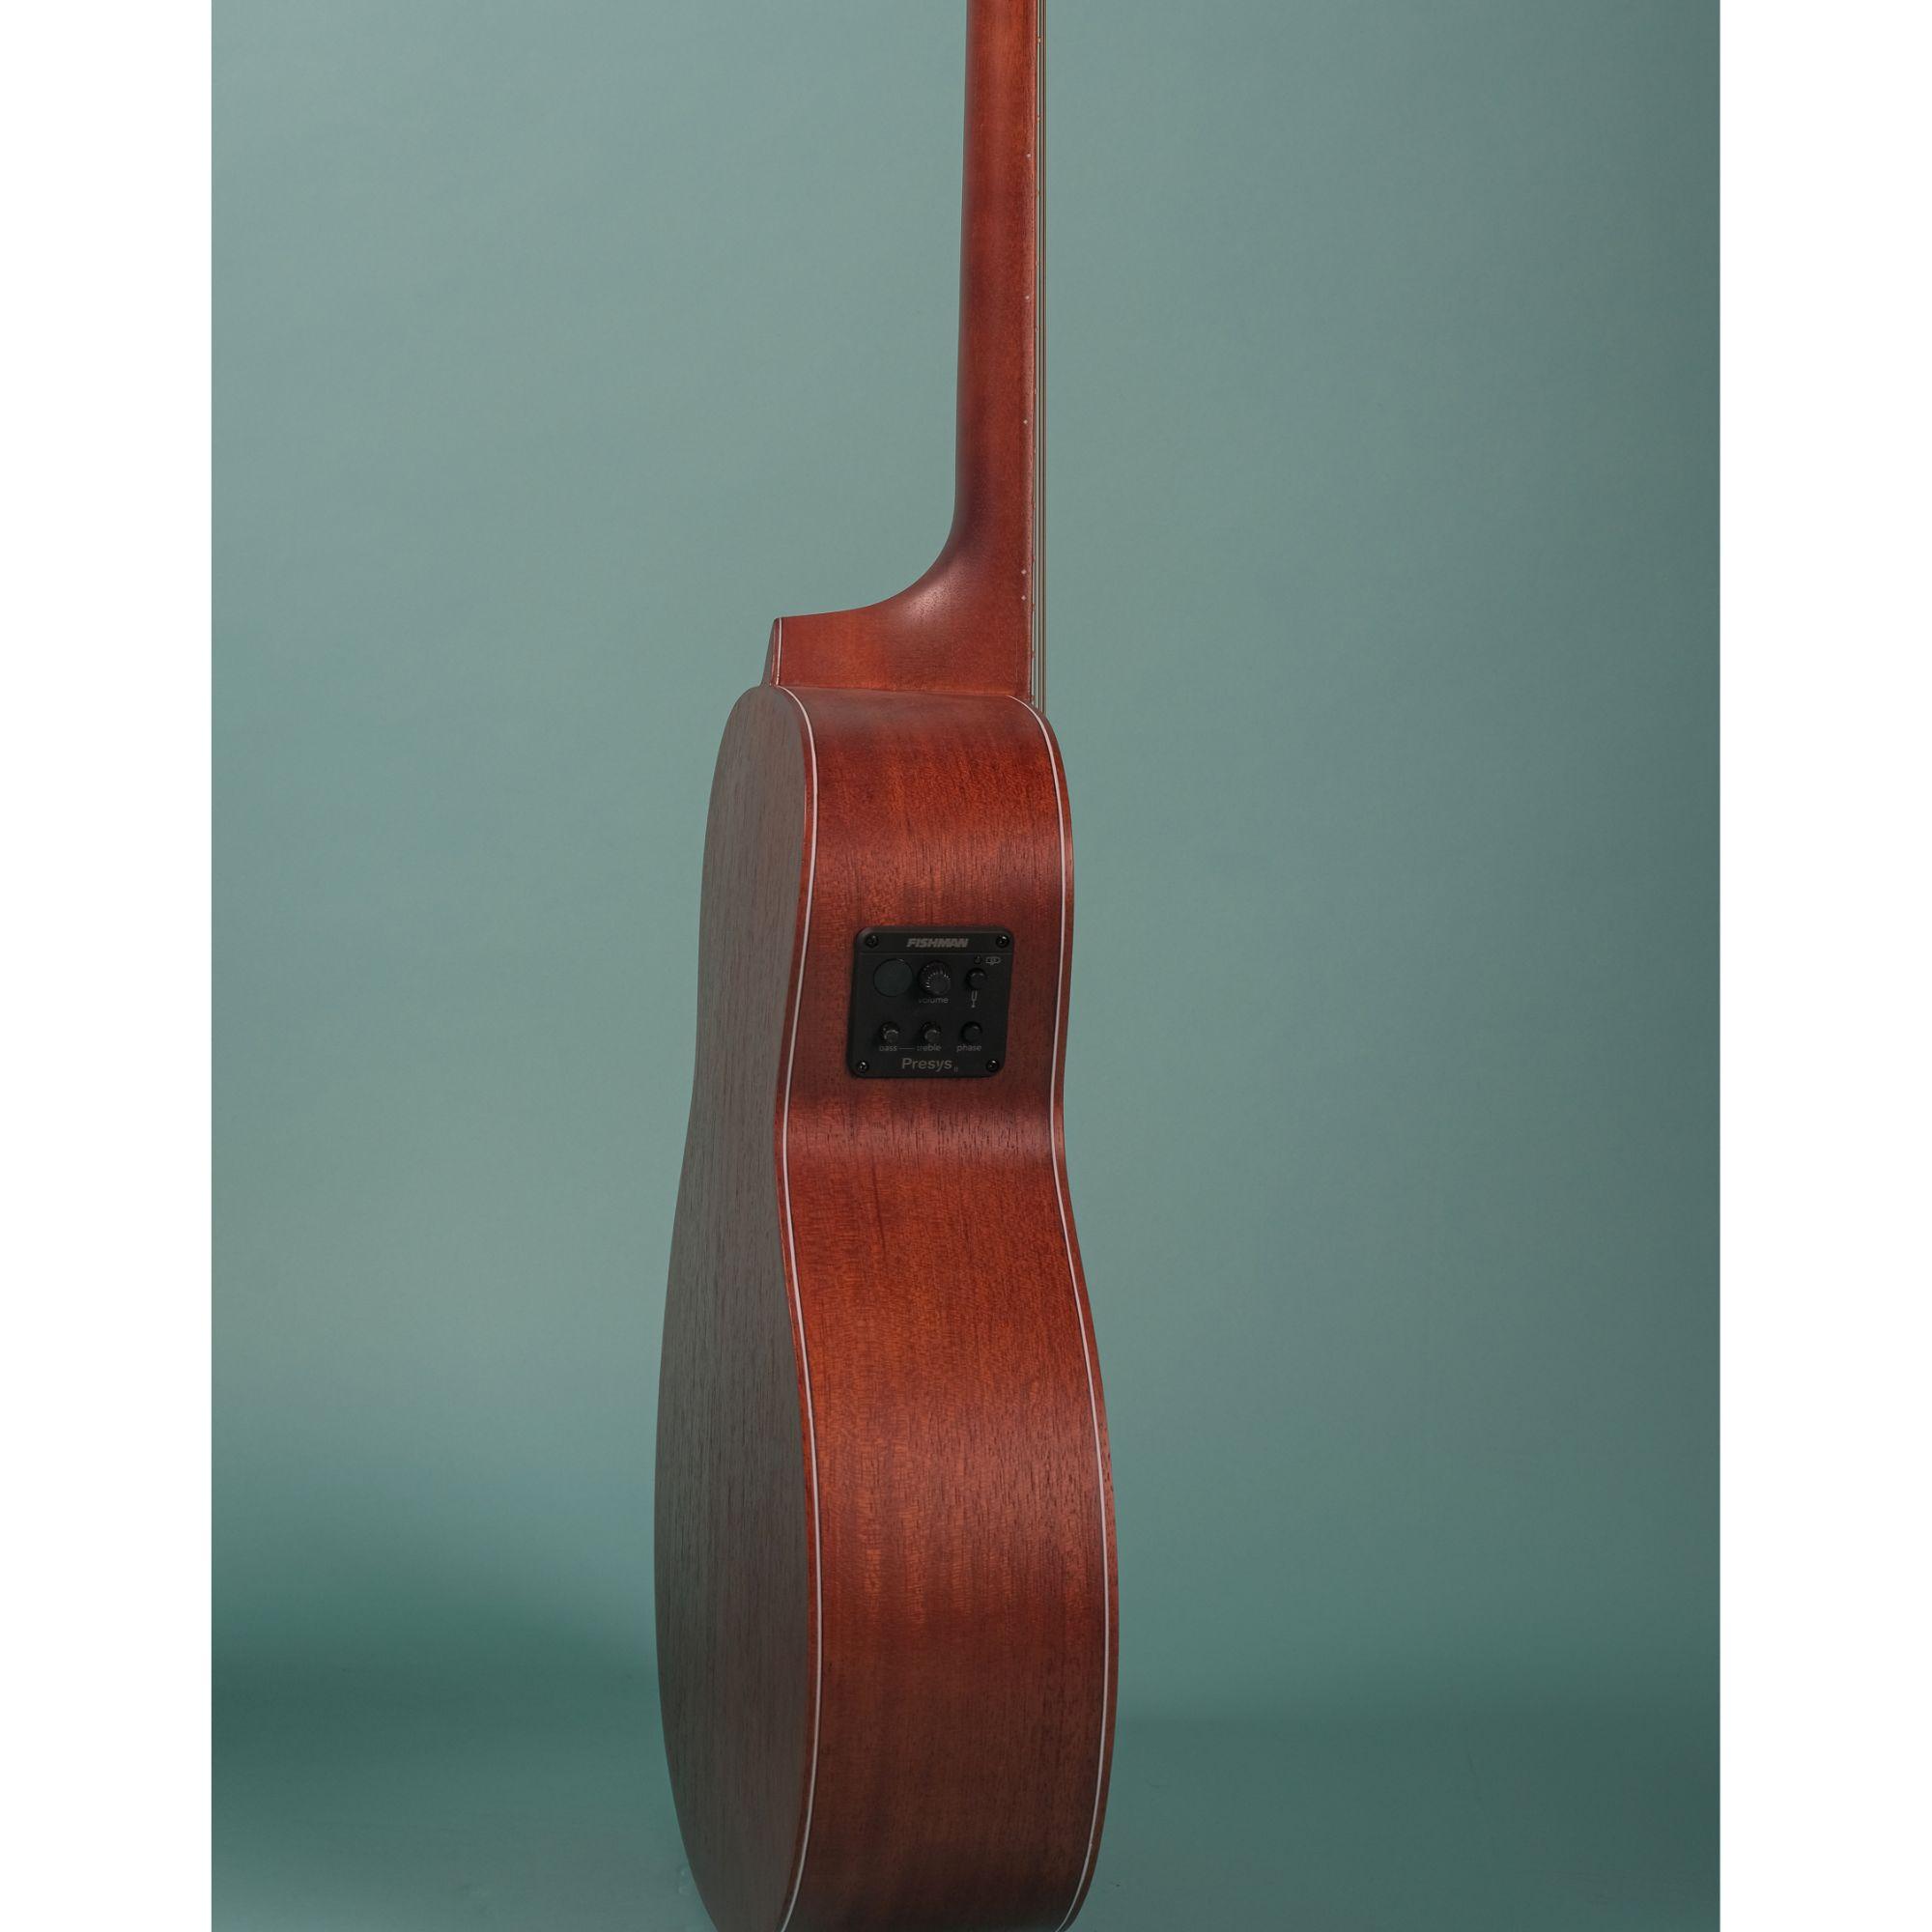 Mantic BG2-E  Travel  Semi-Acoustic Guitar with Fishman Electronics -Mahogany finish